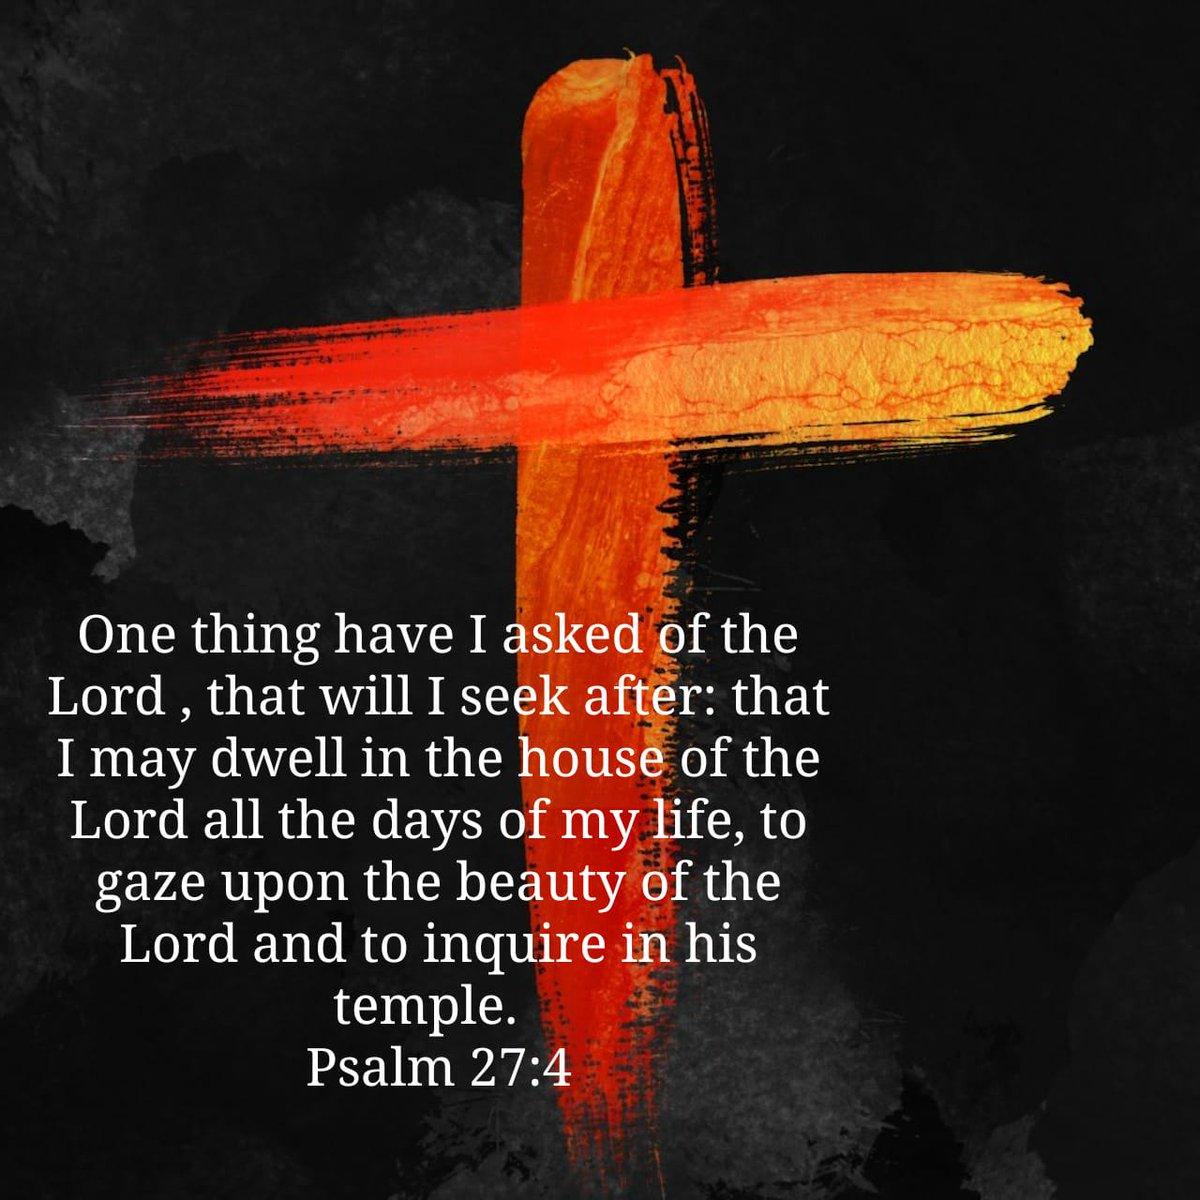 #America #Christ #Jew #Jesus #Love #Jewish #Bible #Forgive #Blessed #Friends #Relationship #Truth #Sunday #Motivation #Familly #Church #Talmud #Theological #FridayMood #Mom  @ListenImKirt @janderson1980 @ABennett828 @ShaunHerholz